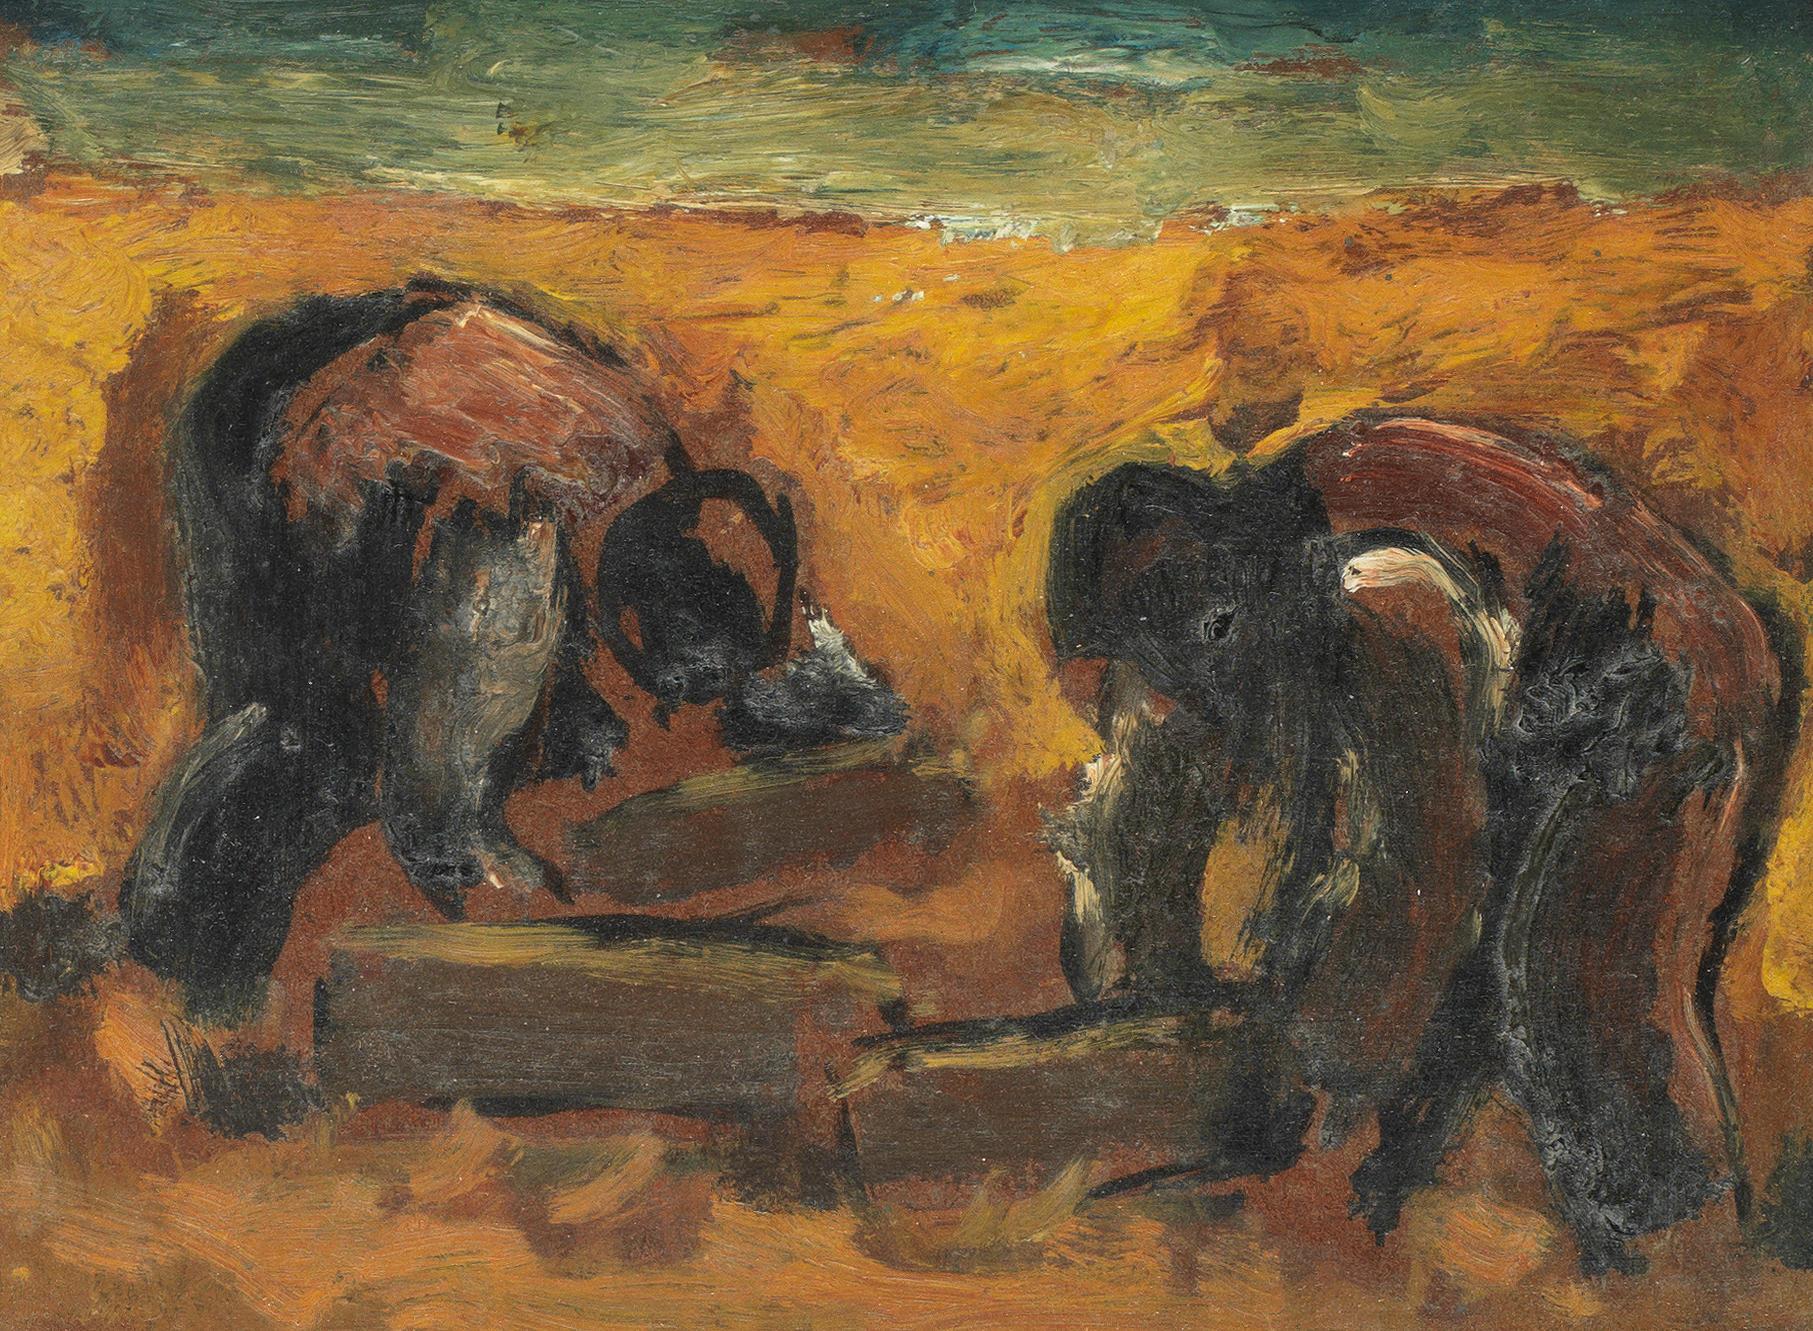 Josef Herman R.A. (British, 1911-2000)